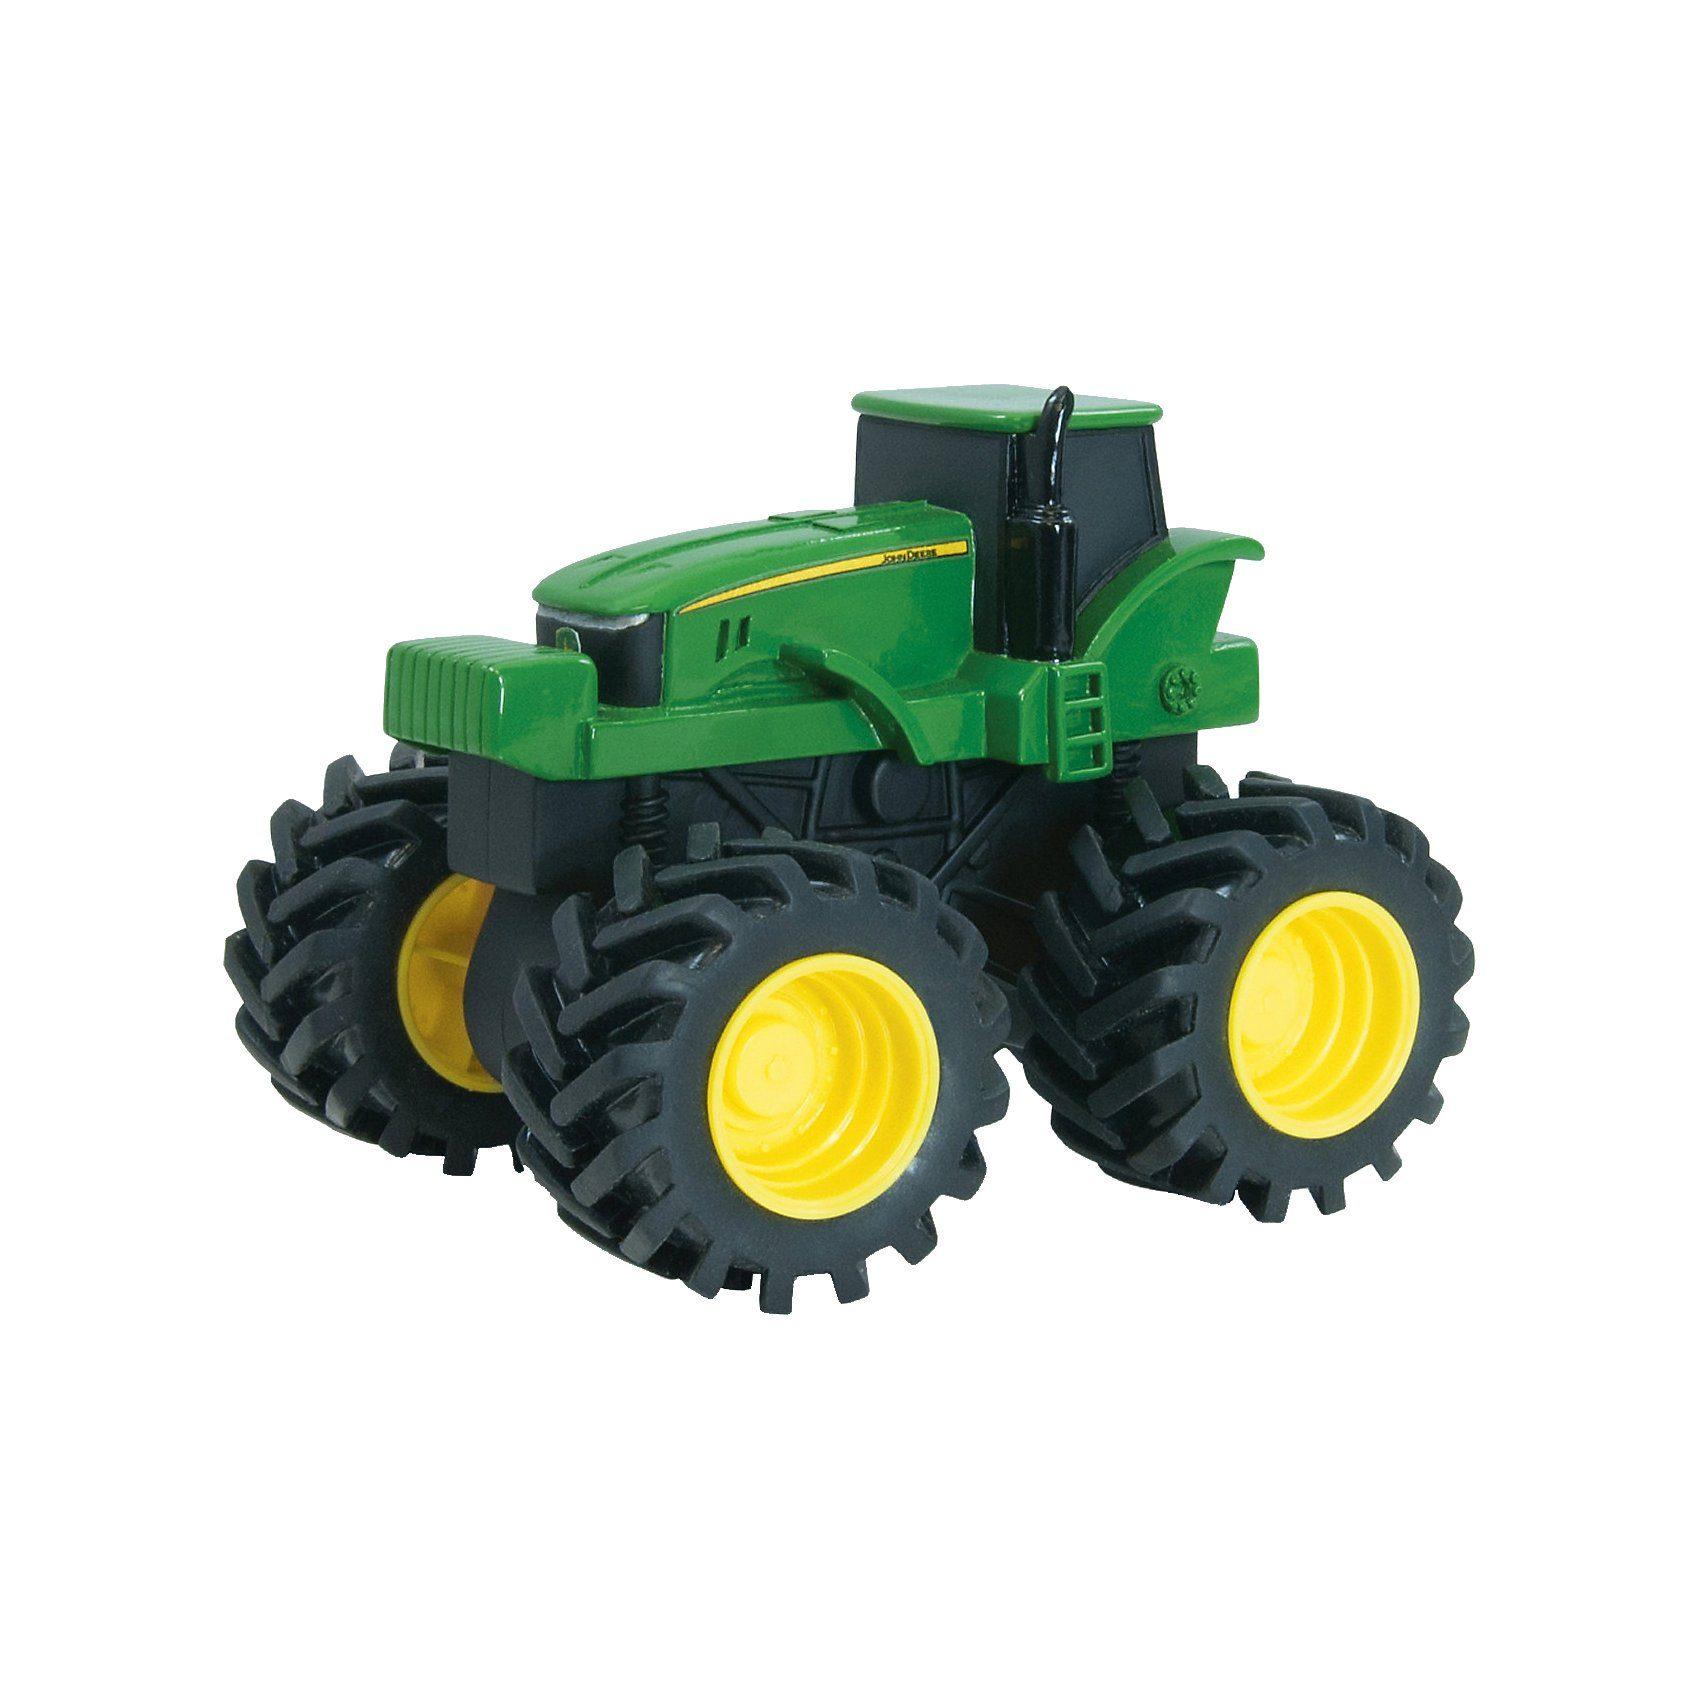 TOMY Monster Treads John Deere Traktor mit Rückziehmotor